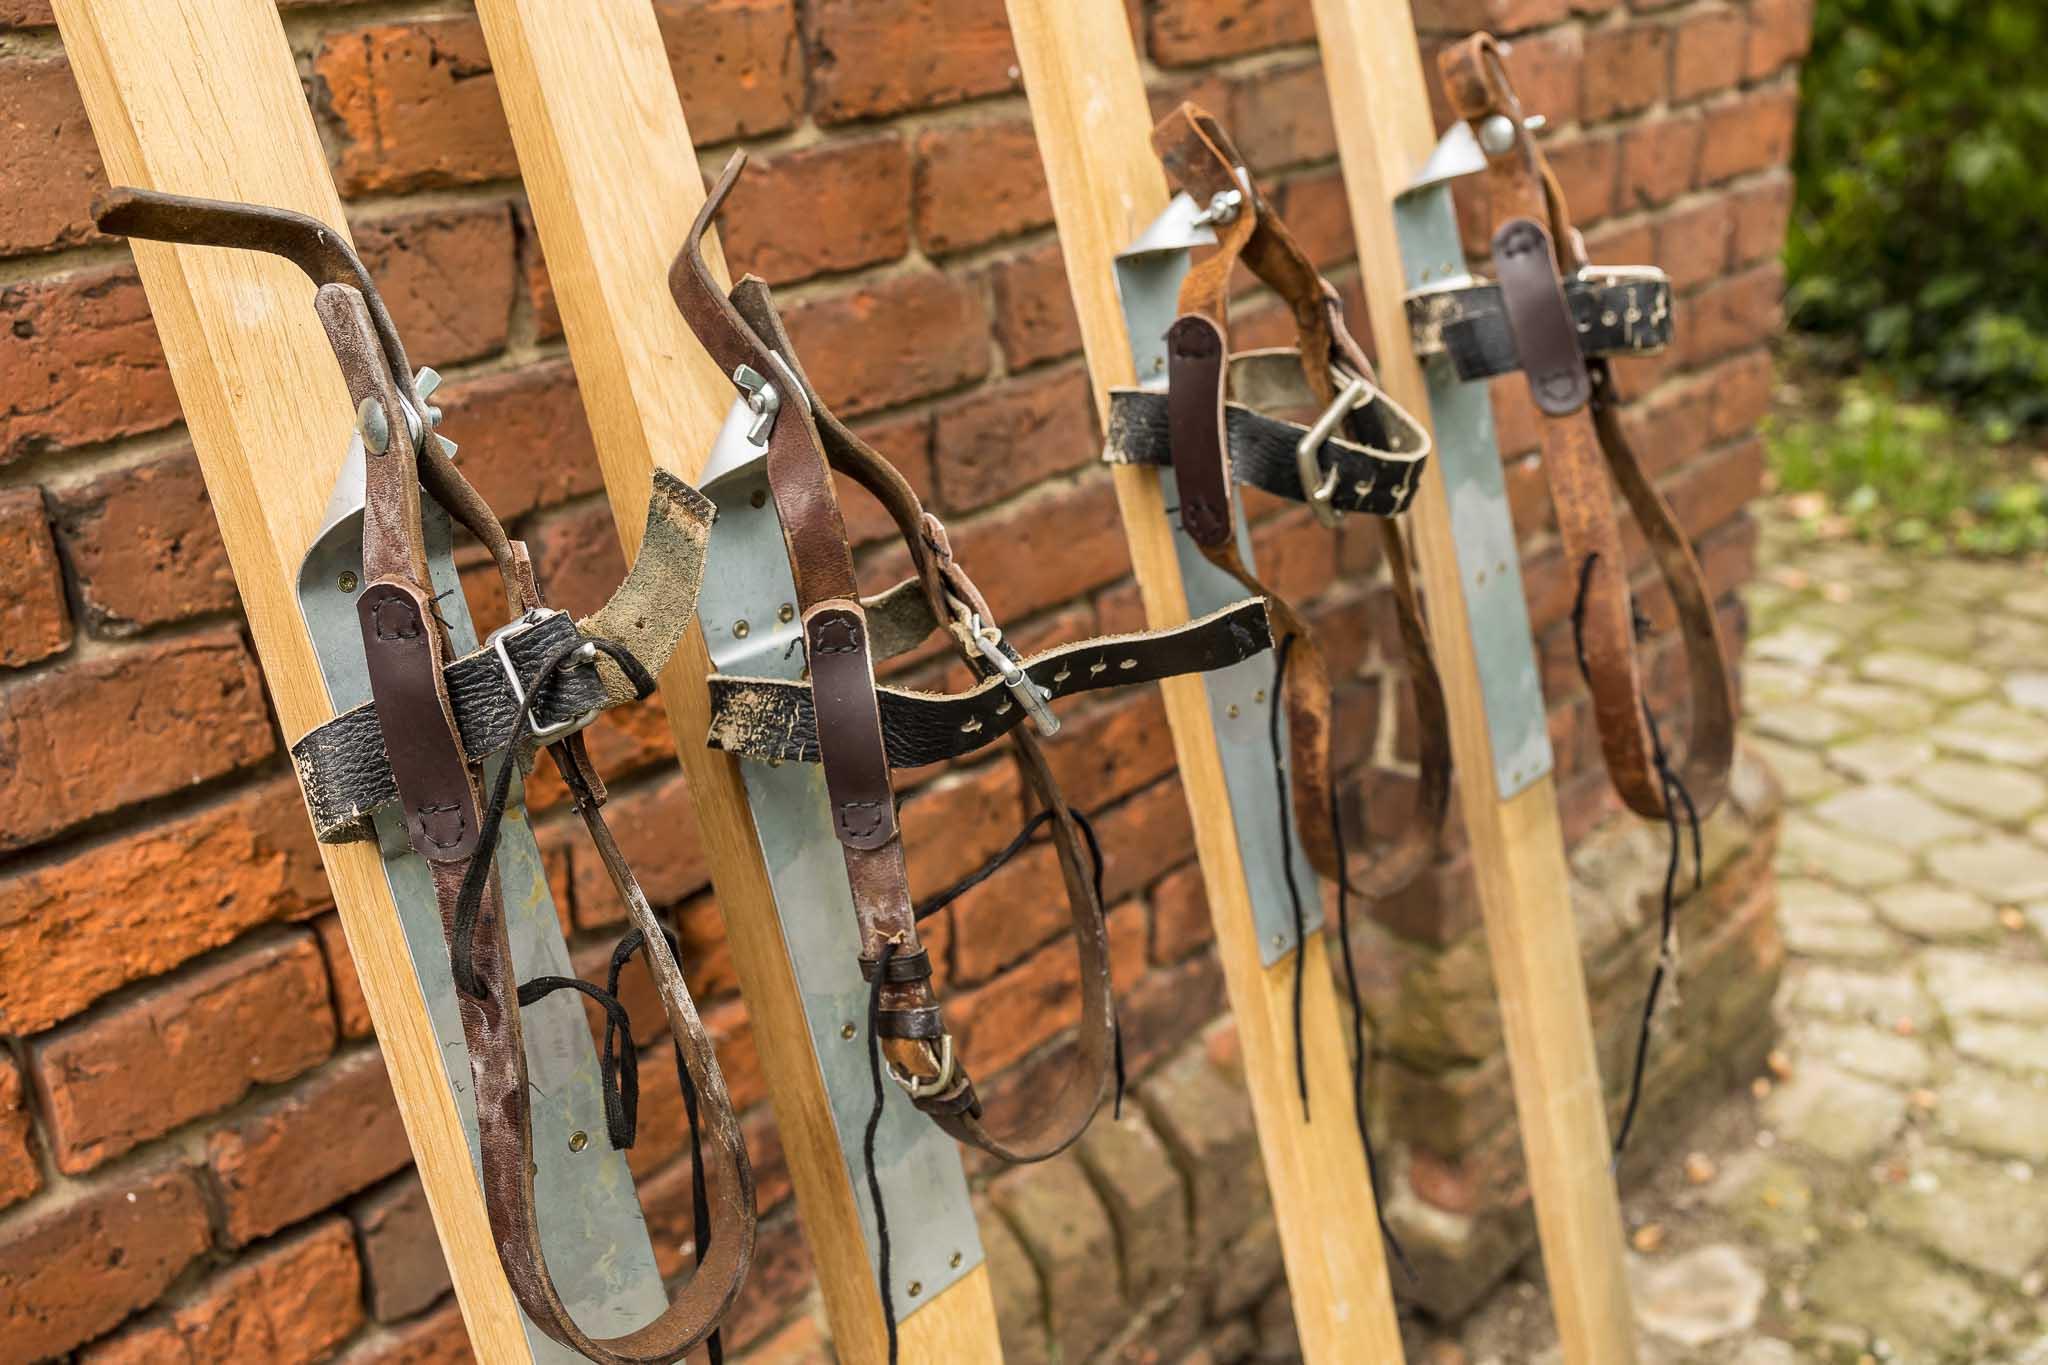 Einfache selbstgebaute Skibindungen aus Lederriemen